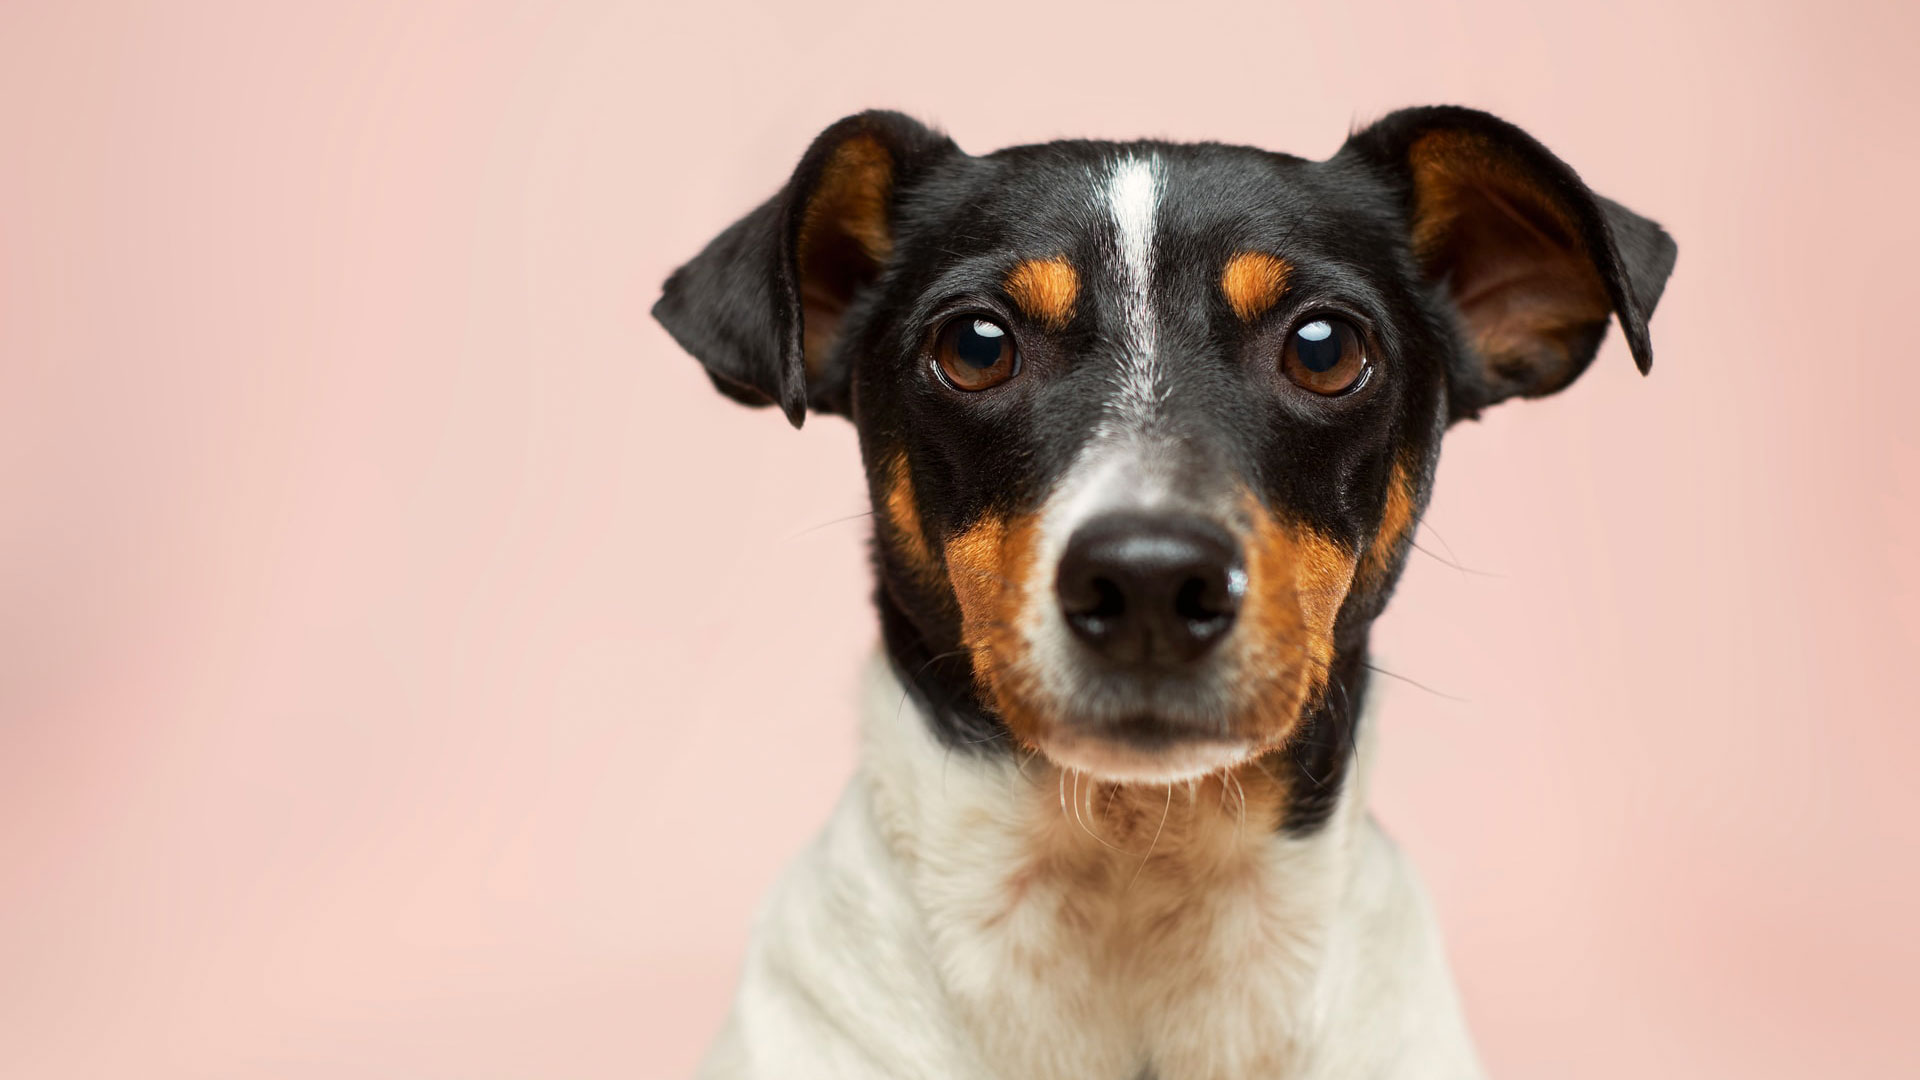 Pet Food & Supplies Prescott, AZ | Preskitt's Pawz n Clawz